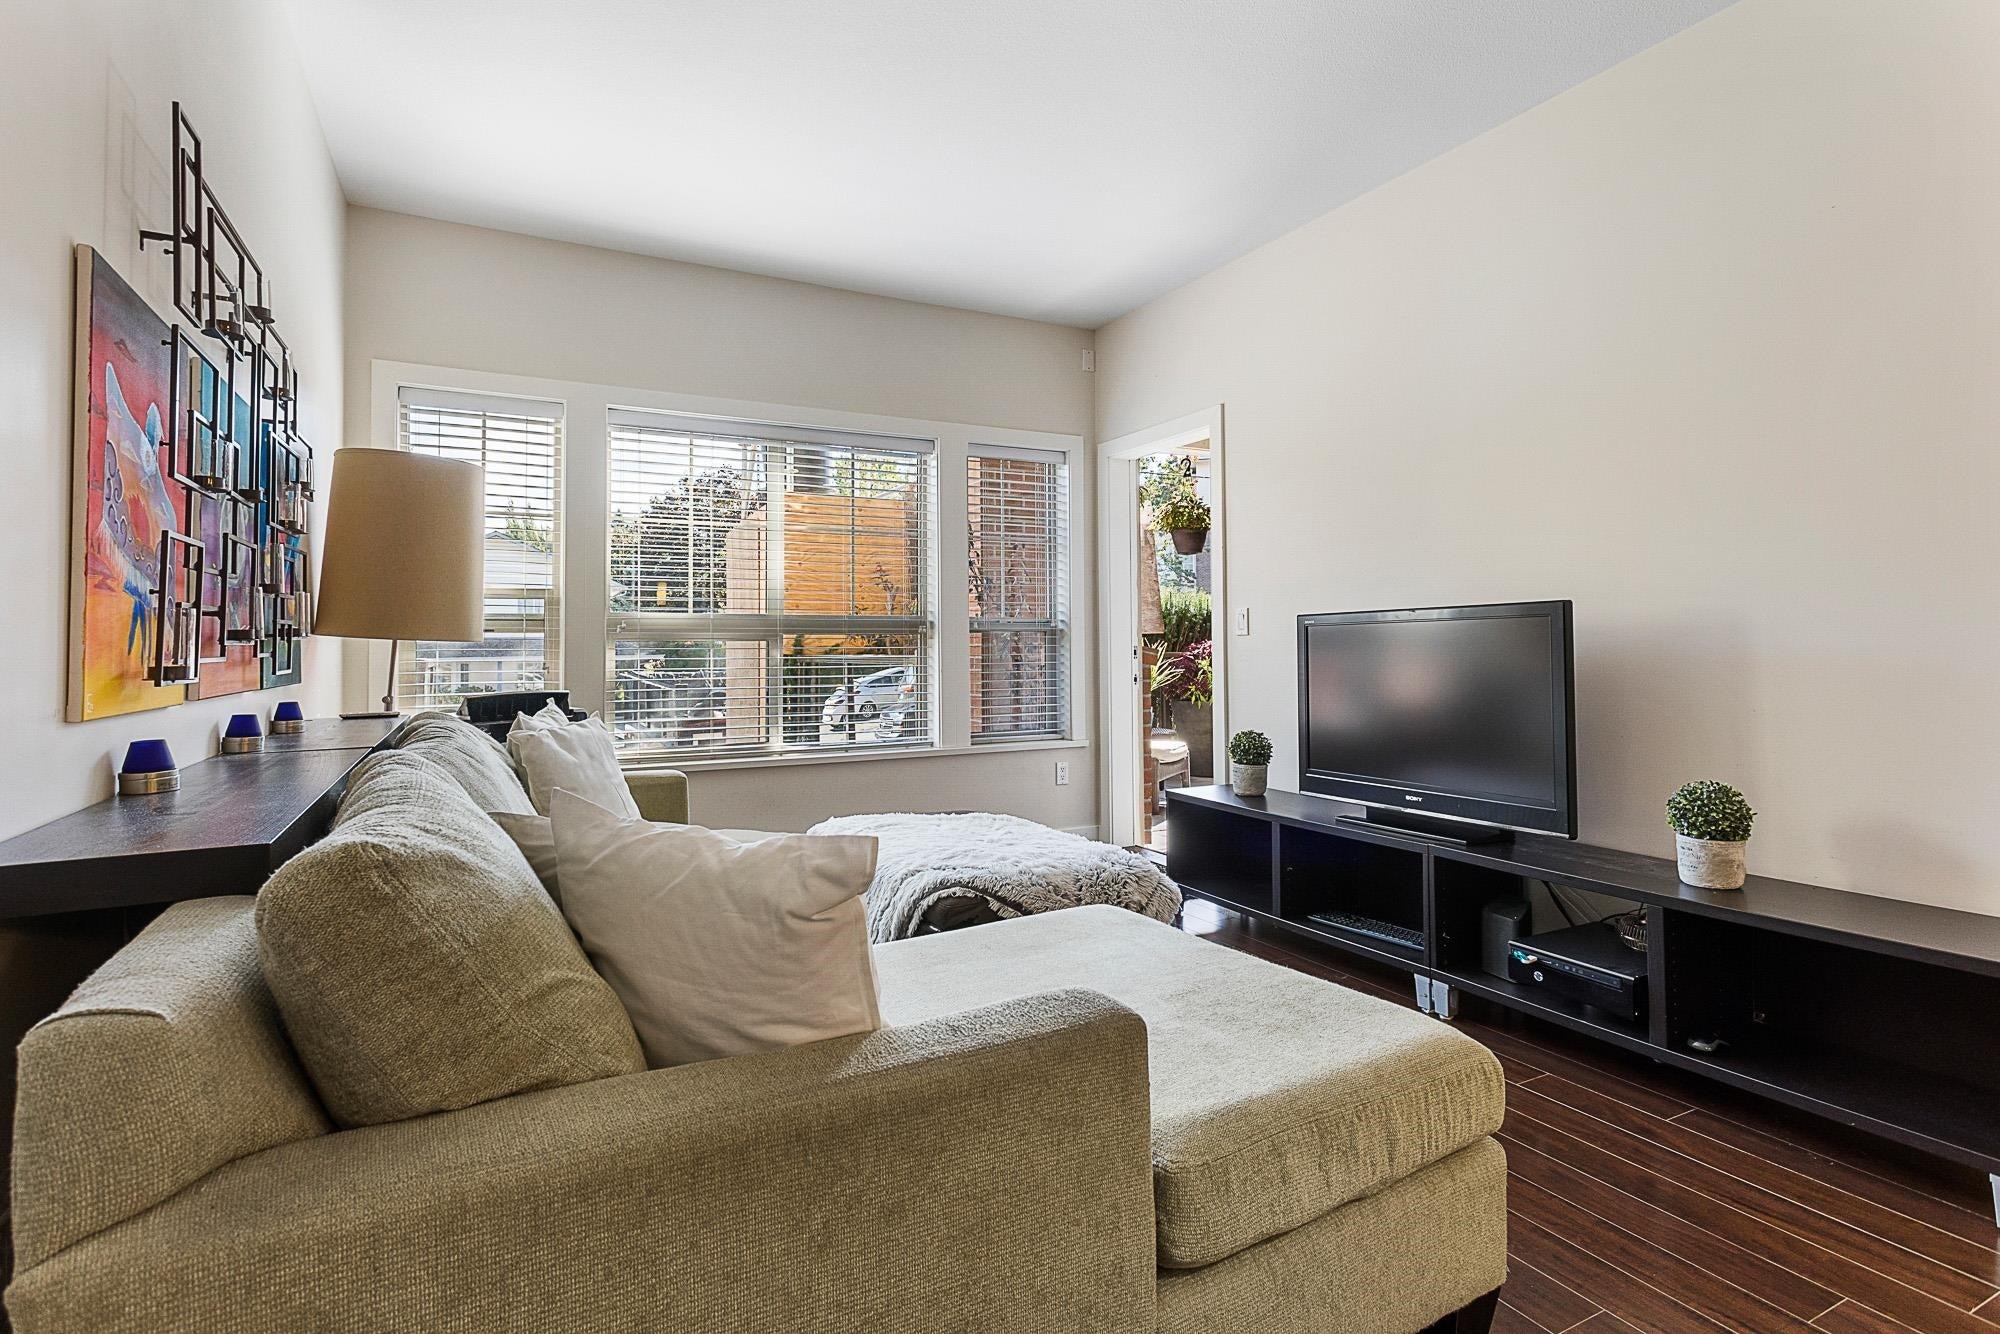 114 20219 54A AVENUE - Langley City Apartment/Condo for sale, 1 Bedroom (R2616172) - #13